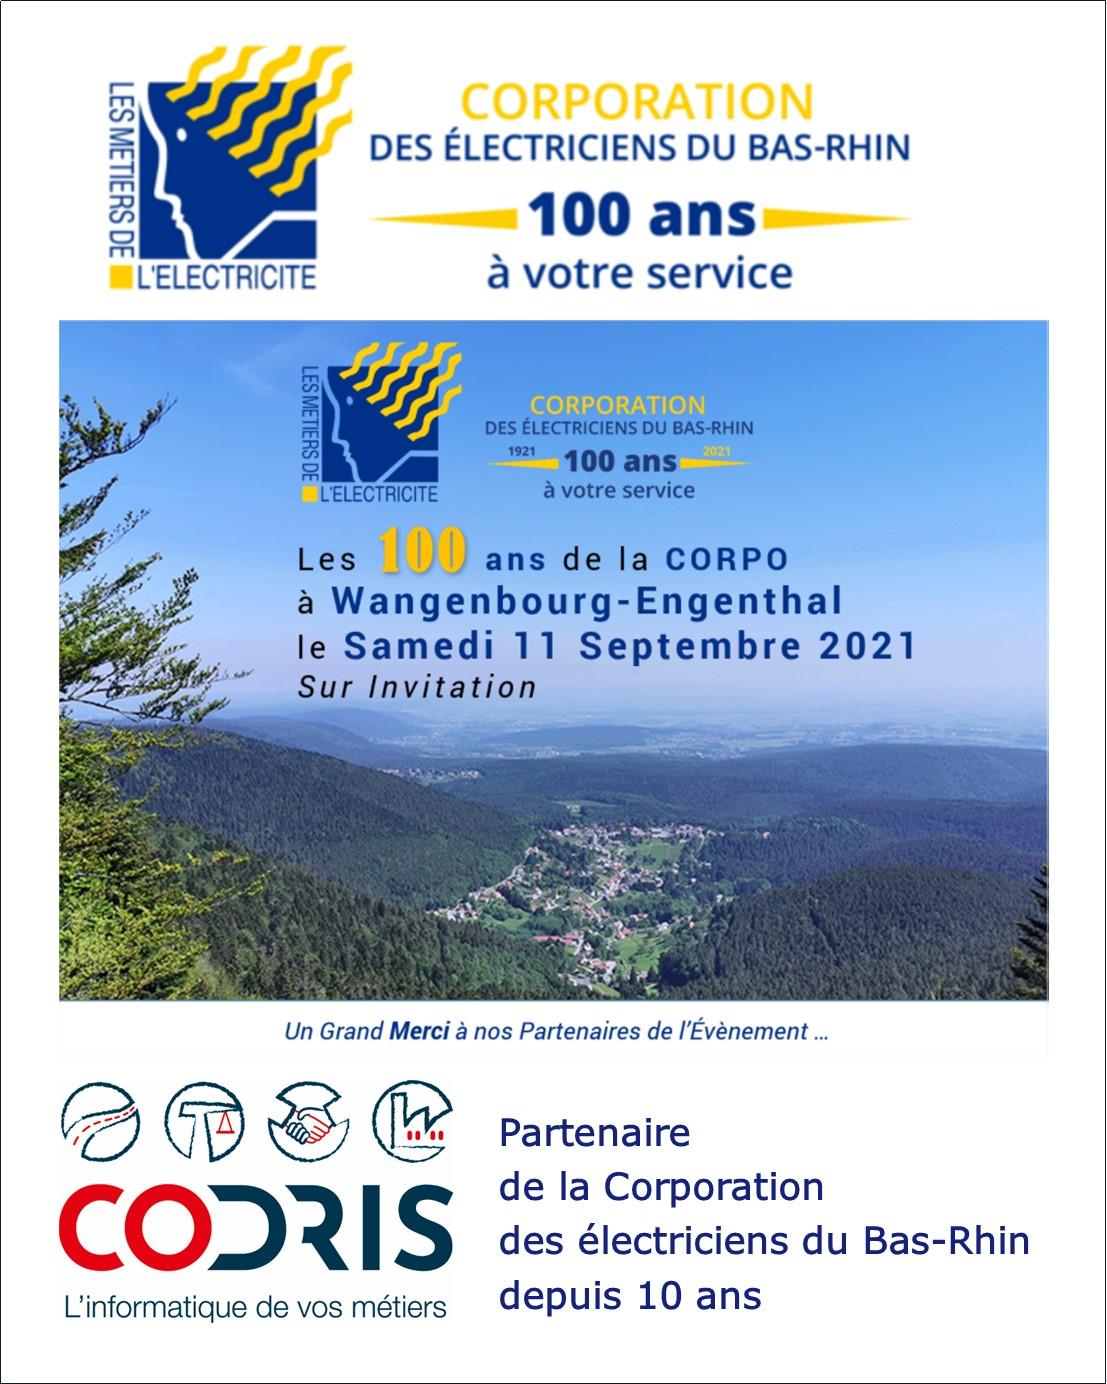 Eurometropole Strasbourg CODRIS